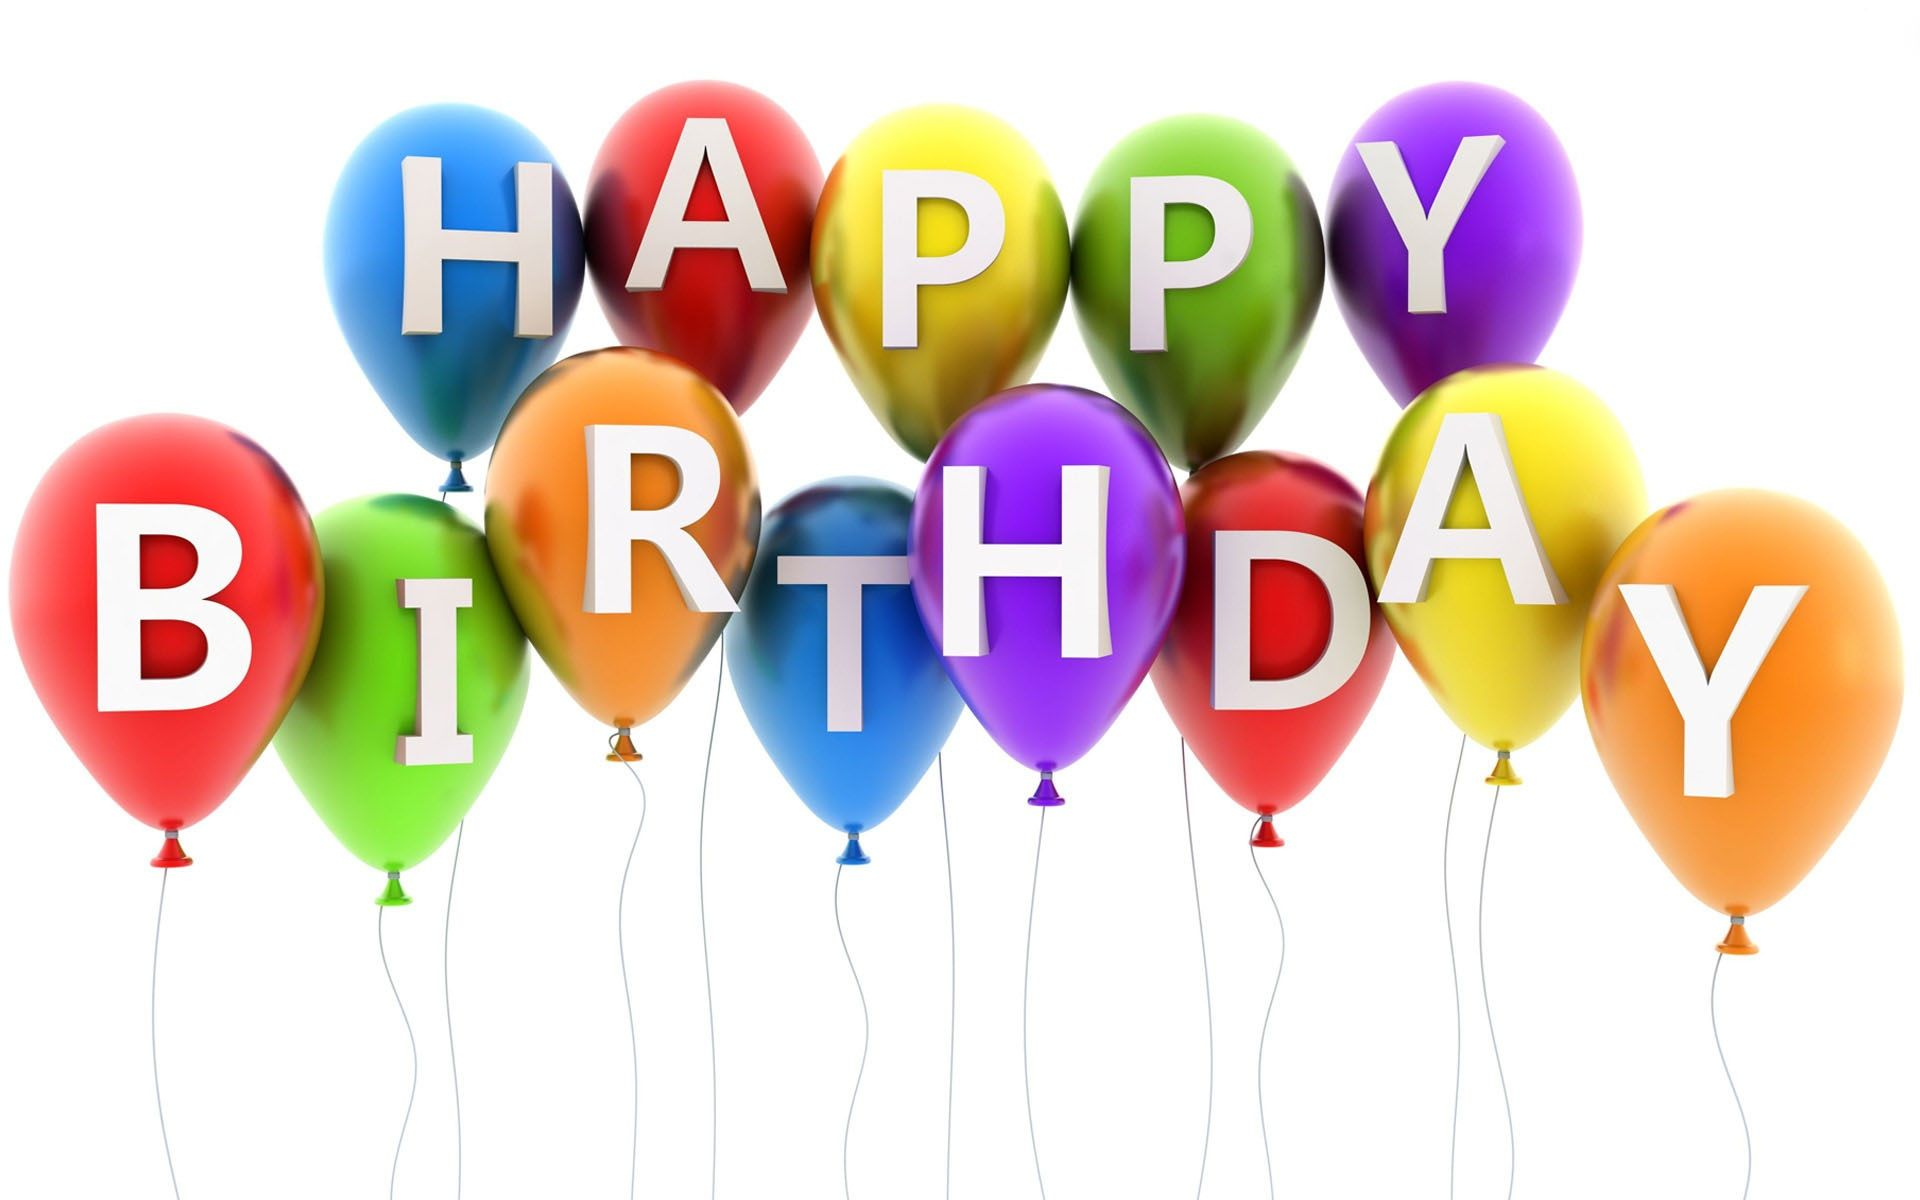 Happy Birthday Wishes ❤ Happy Birthday Quotes ❤ Happy Birthday Messages ❤  Special Birthday Wishes ❤ Best Birthday Quotations ❤ Short Birthday Msgs